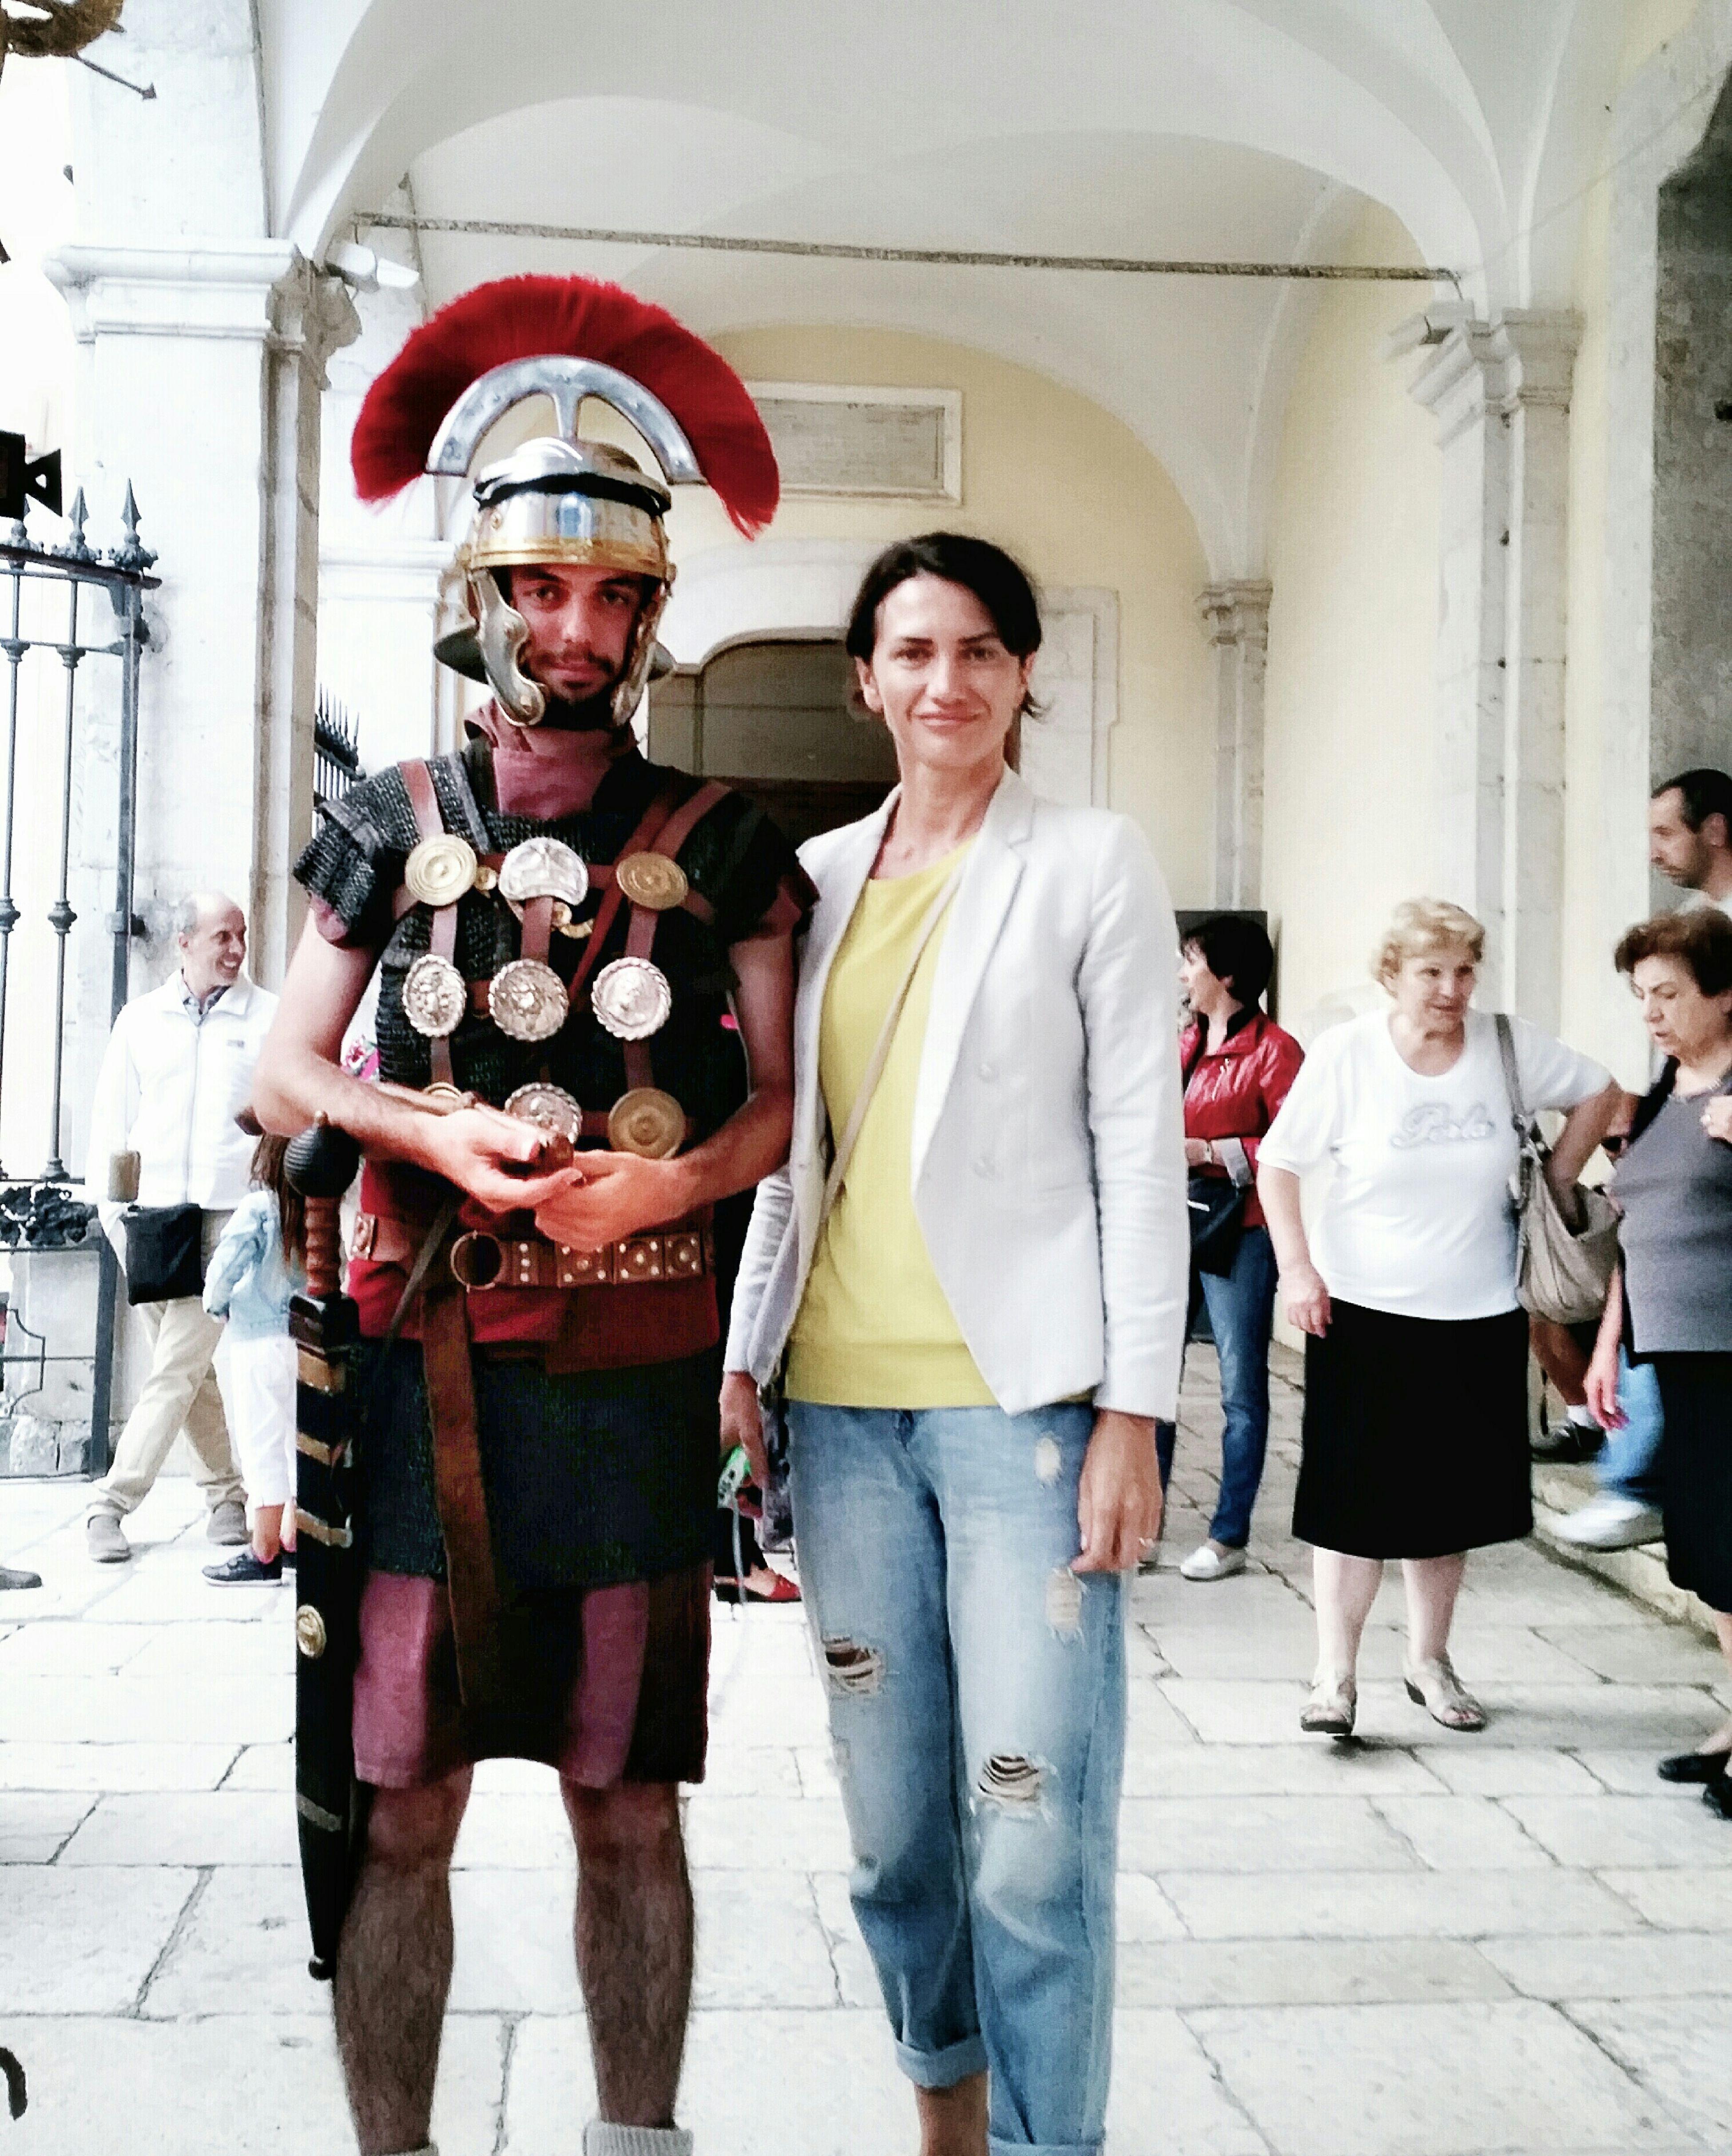 la divisa spesso diventa un arma disarmante - мужчину красит униформа Legionário легионер римский Romano Soldato Romano Divisa униформа мужчина Uomo Италия